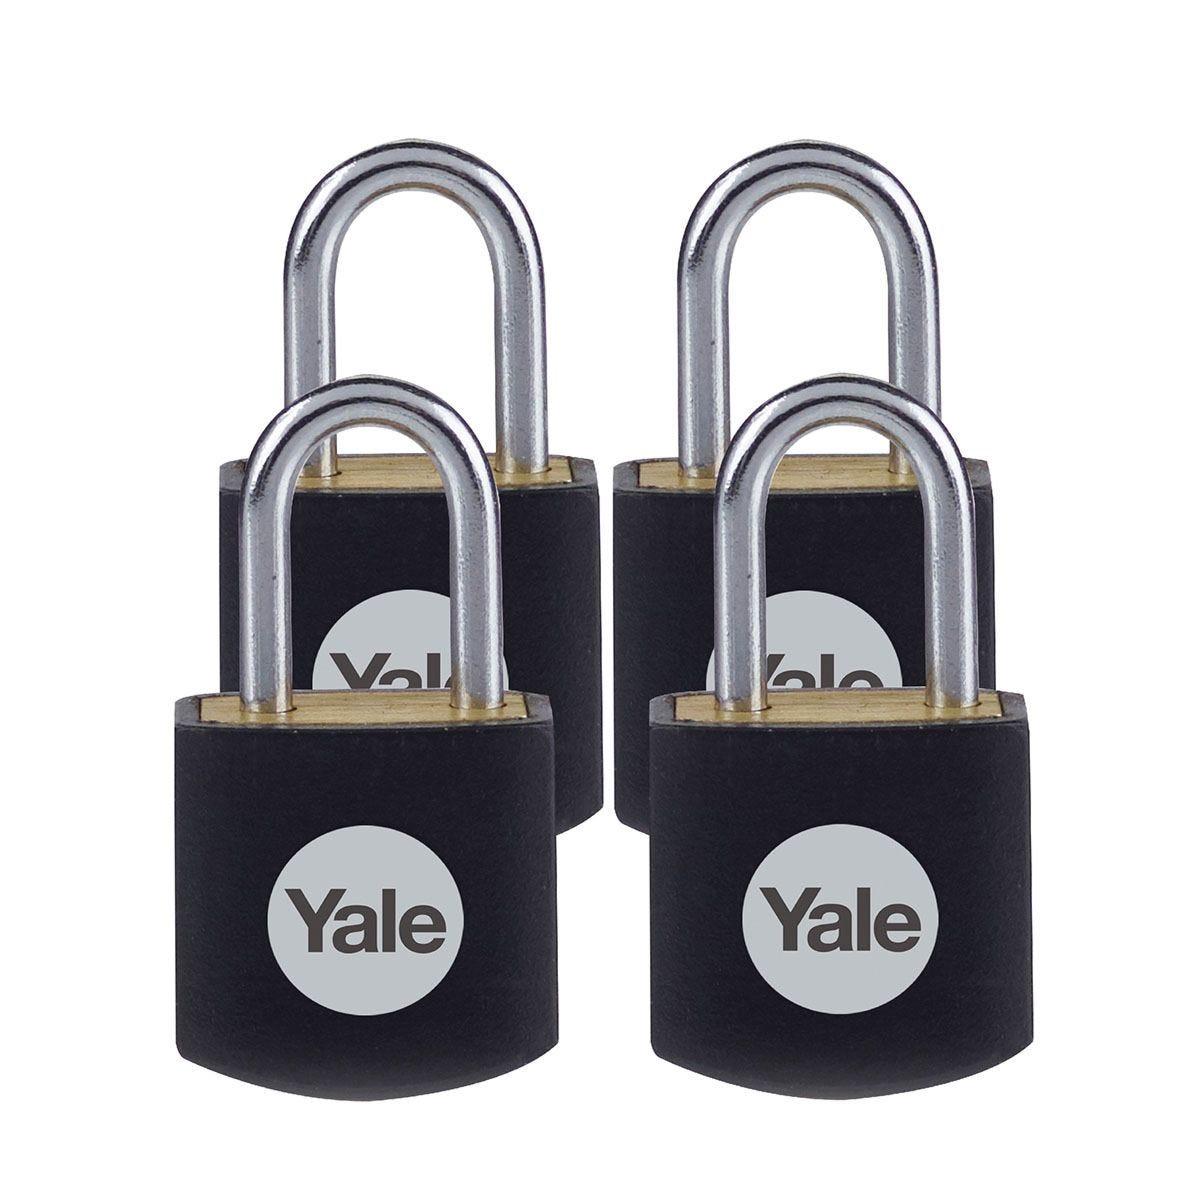 Yale Brass Padlock 15mm - Pack of 4